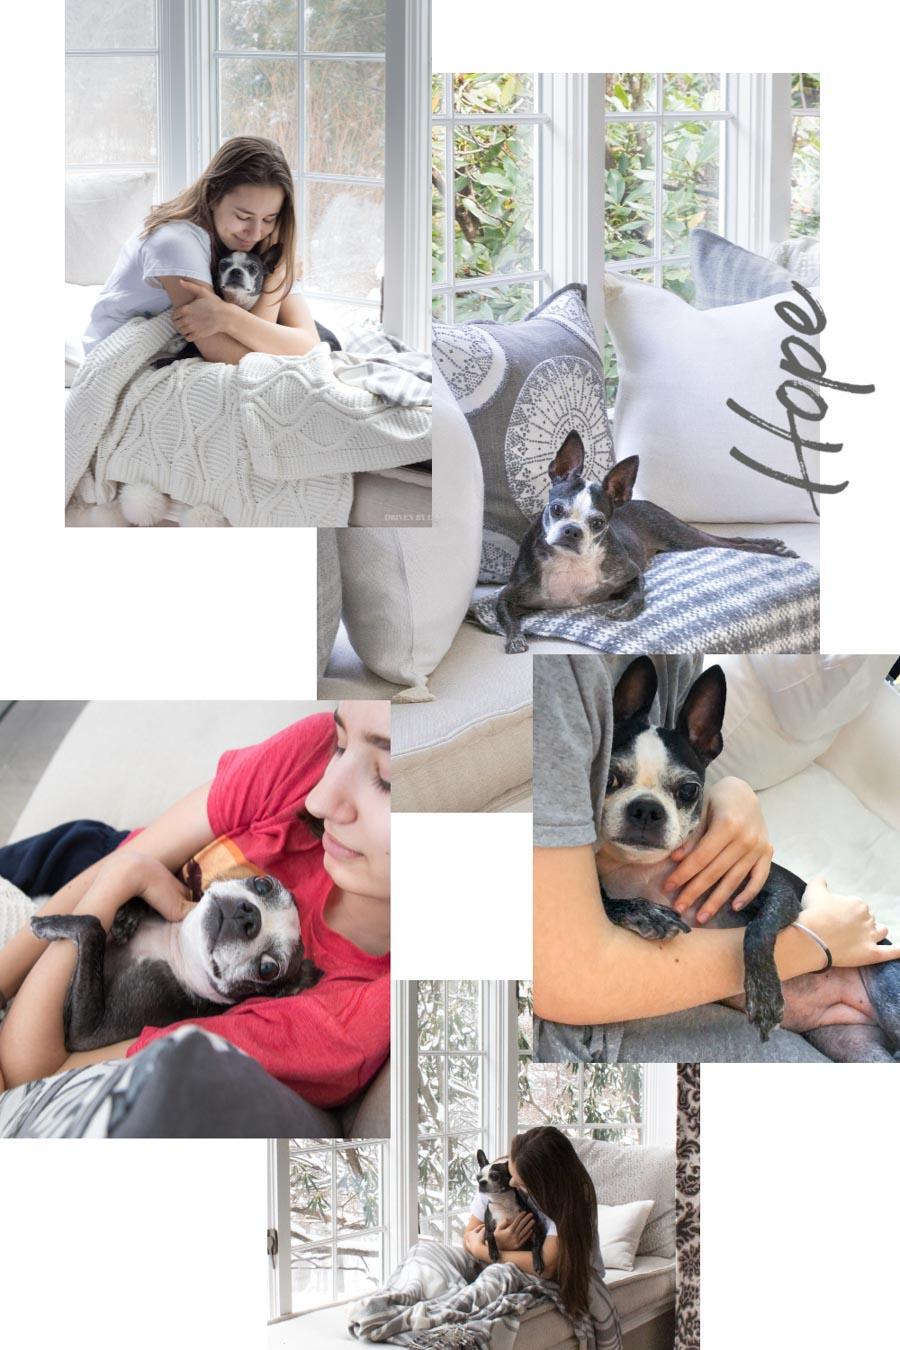 Our sweet Boston terrier